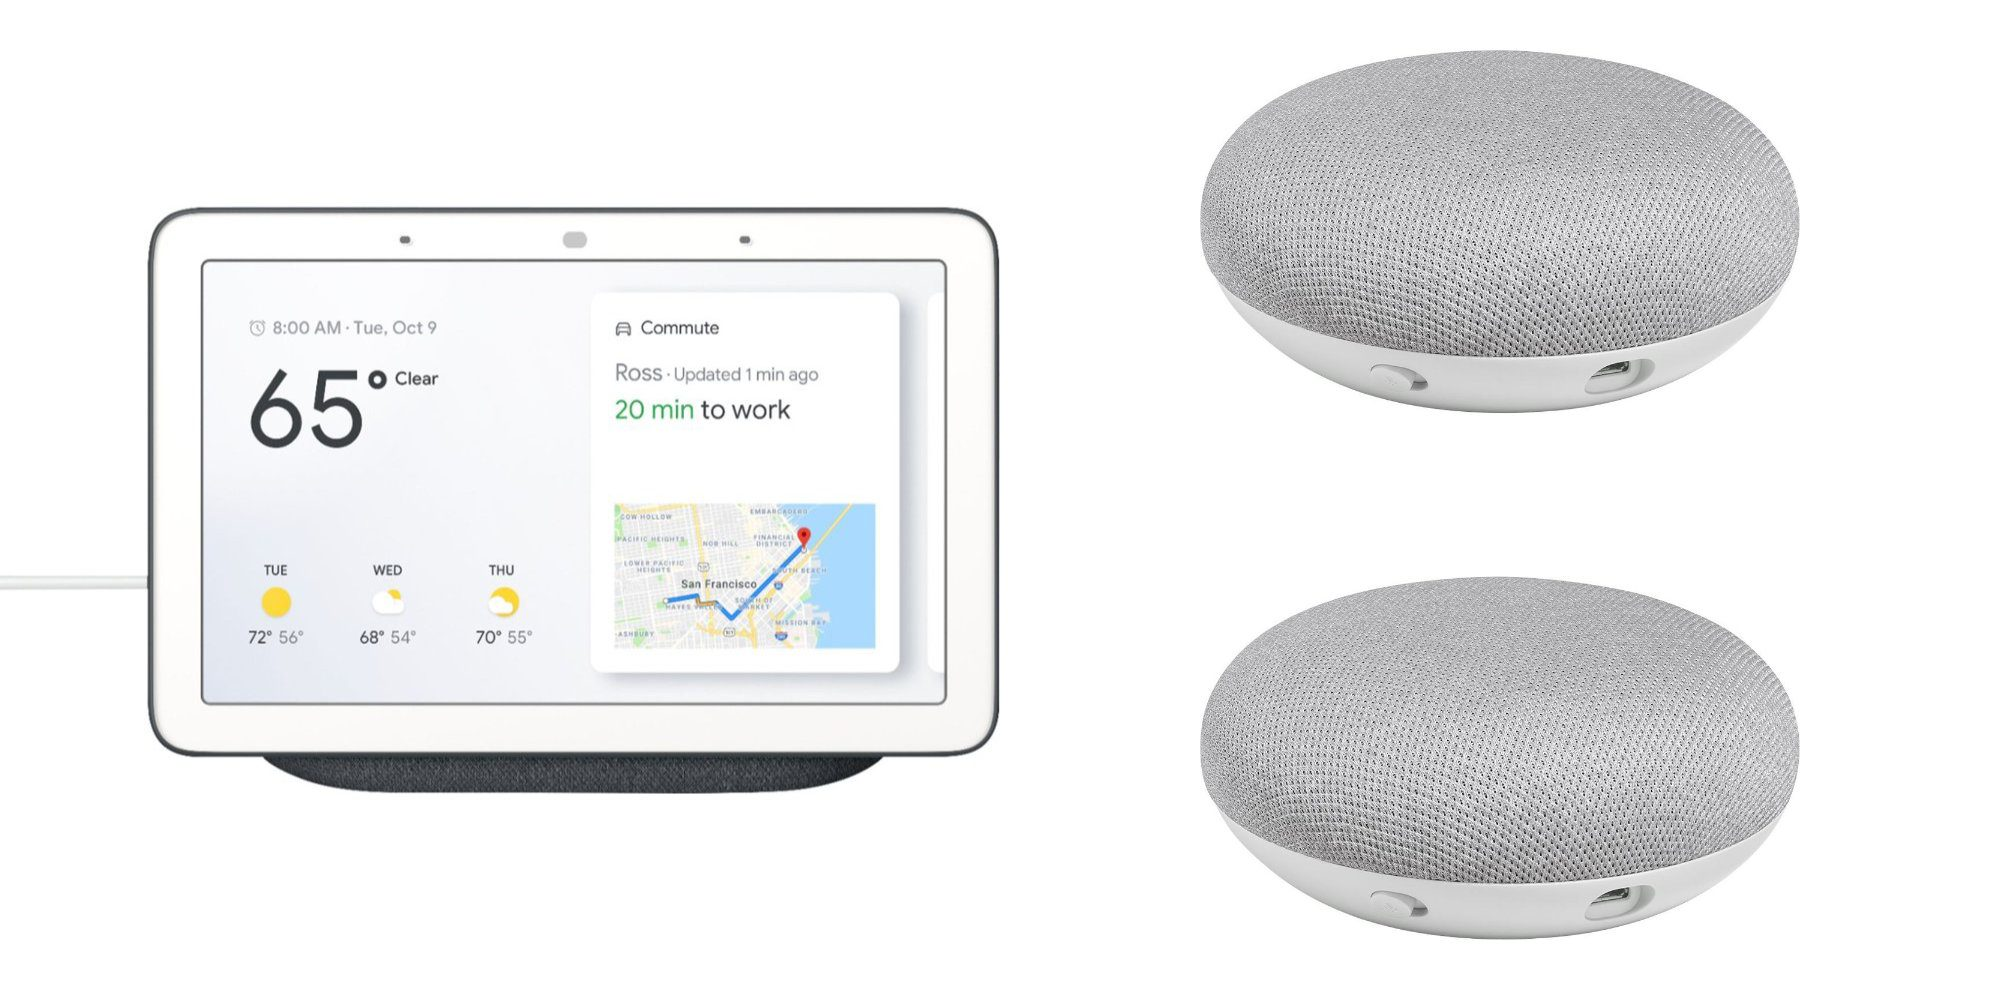 9to5Toys Letzter Anruf: Daydream View VR Headset 15, Best Buy 3-Day Sale, V-MODA Crossfade Wireless-Kopfhörer 99, mehr